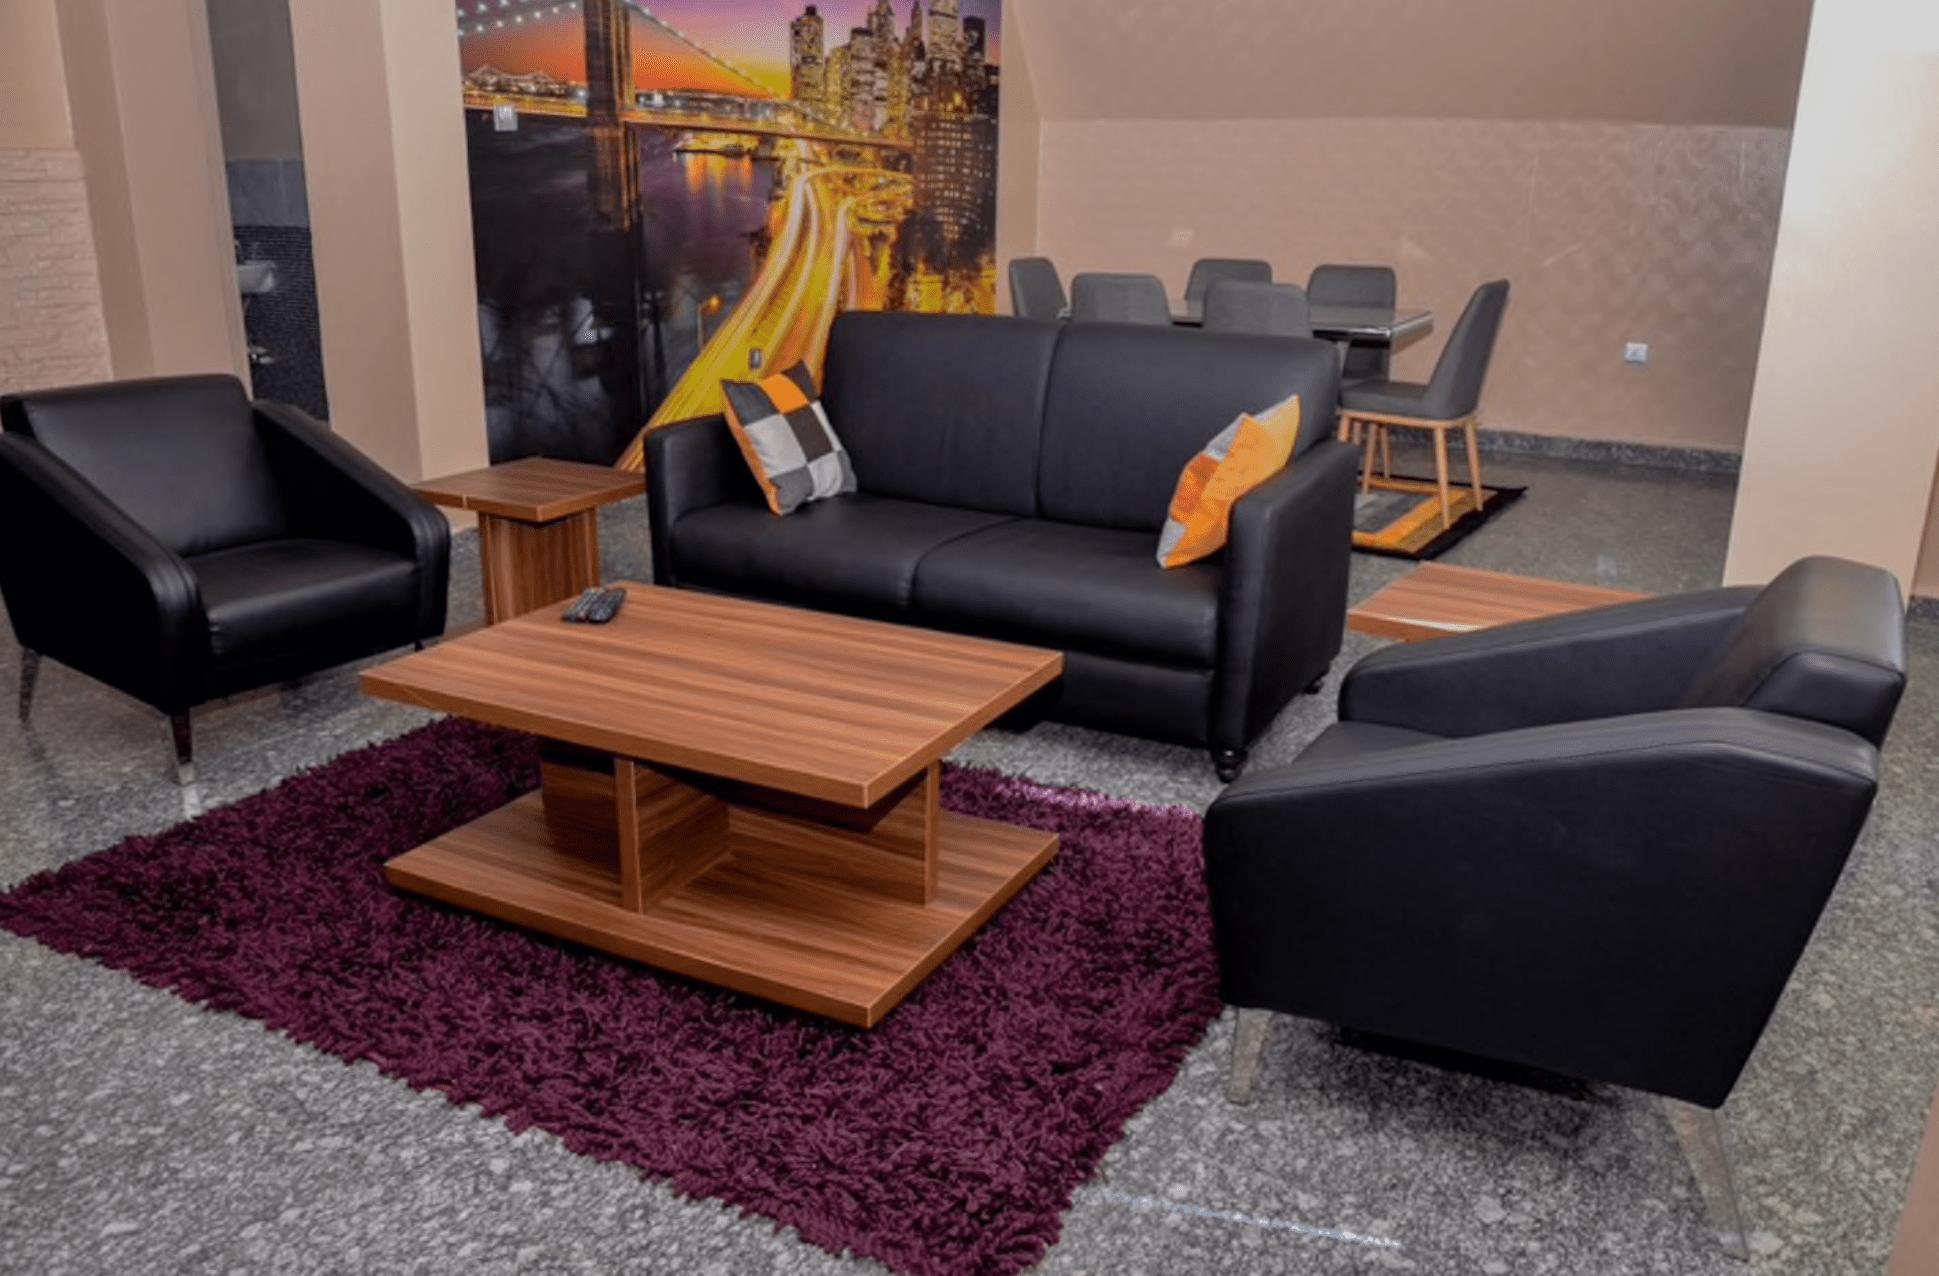 airbnb penthouse abuja